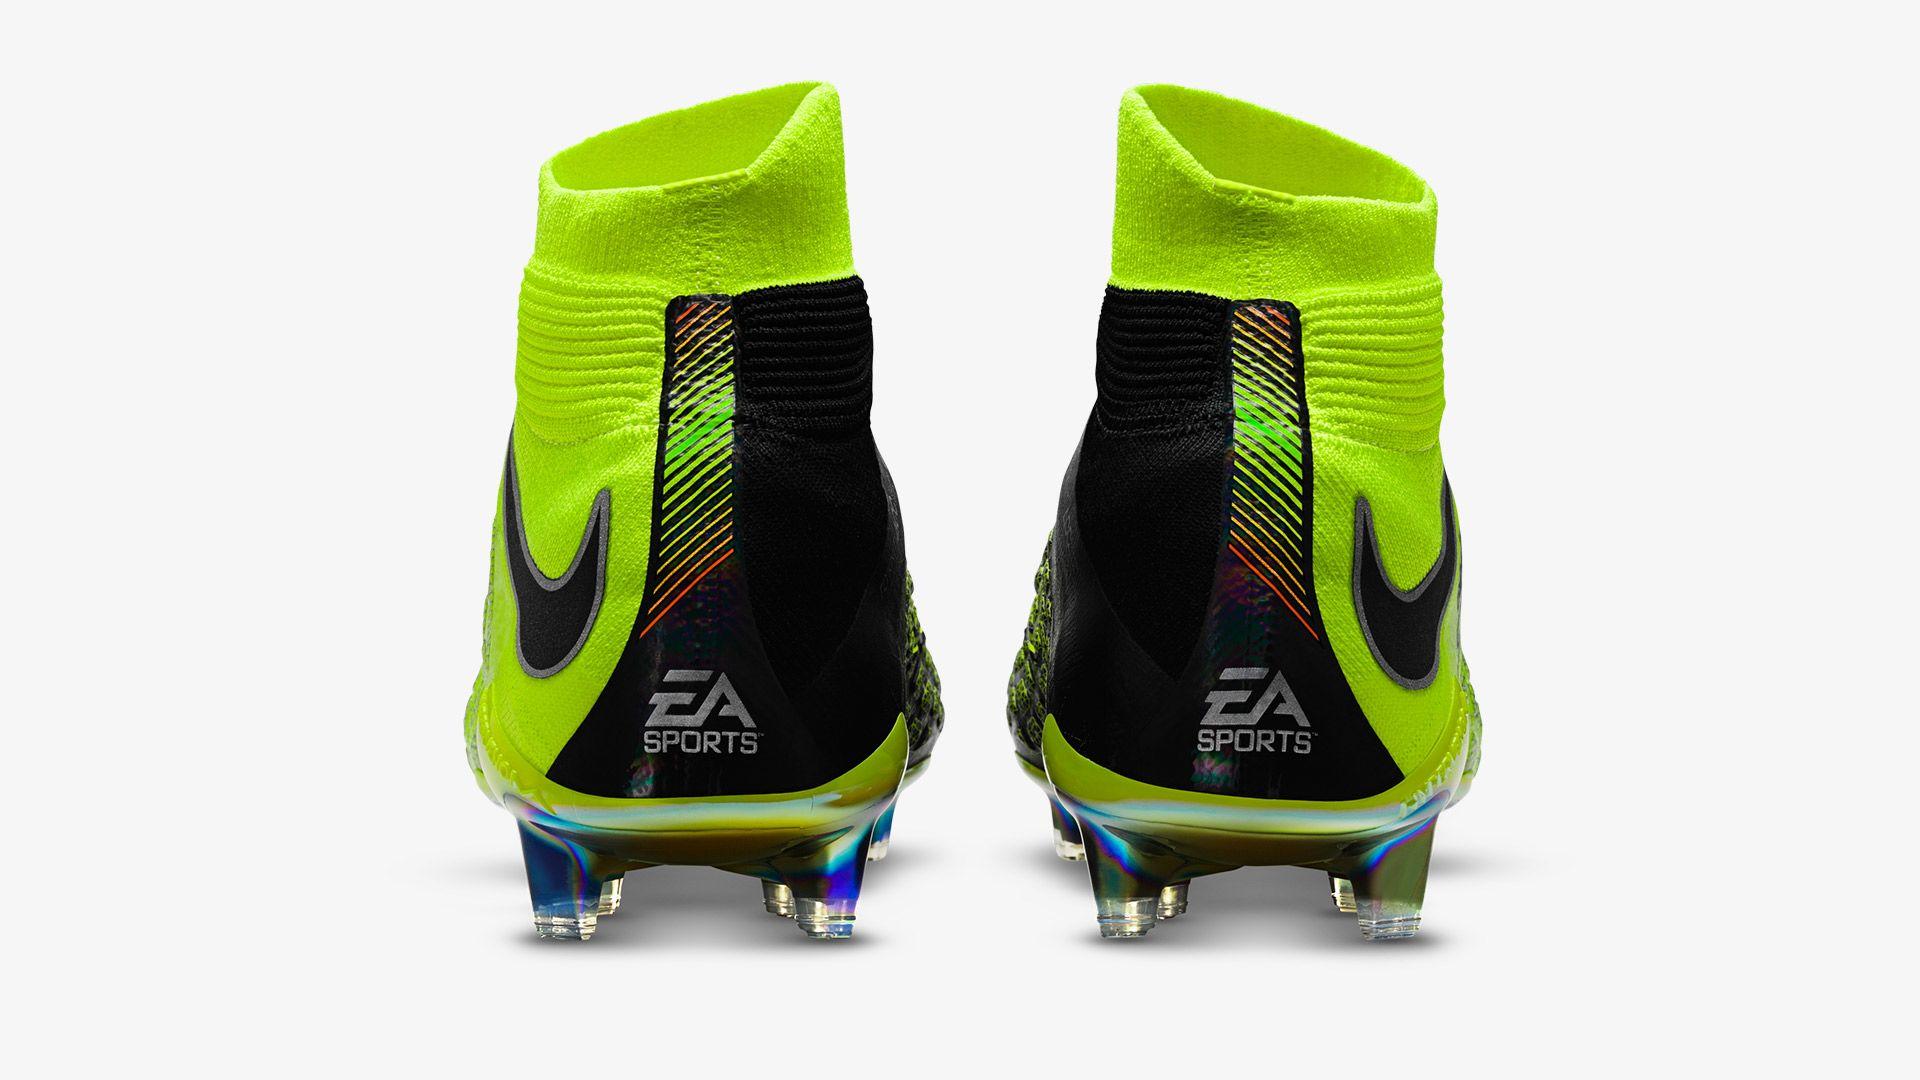 new product 98a95 9abc6 Nike Hypervenom Phantom III DF FG 'EA SPORTS'. Nike.com